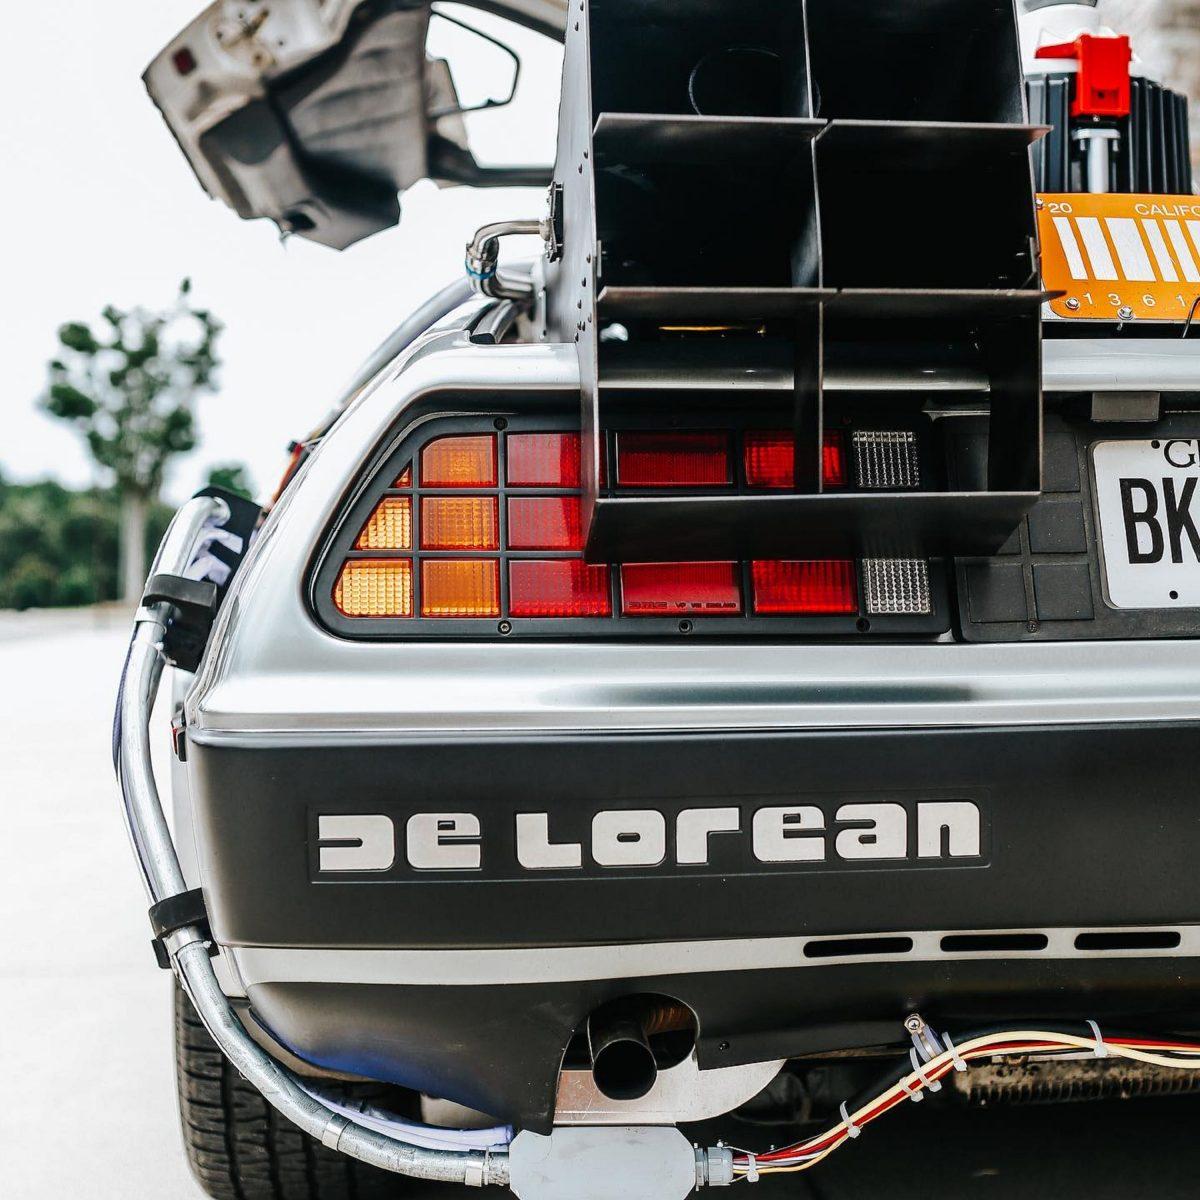 DeLorean example